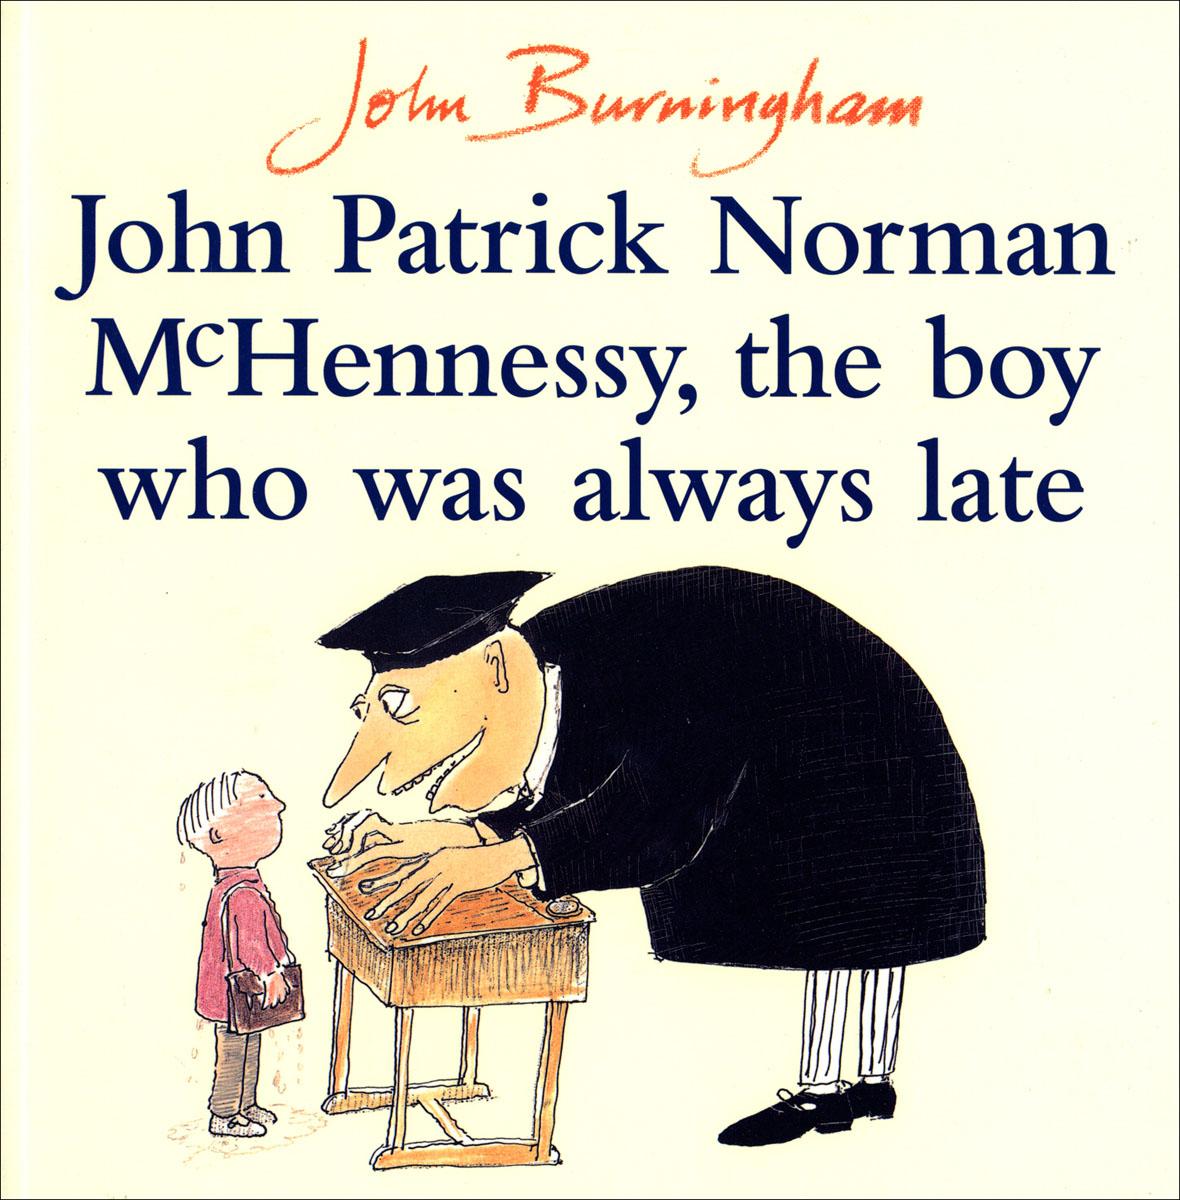 John Patrick Norman McHennessy